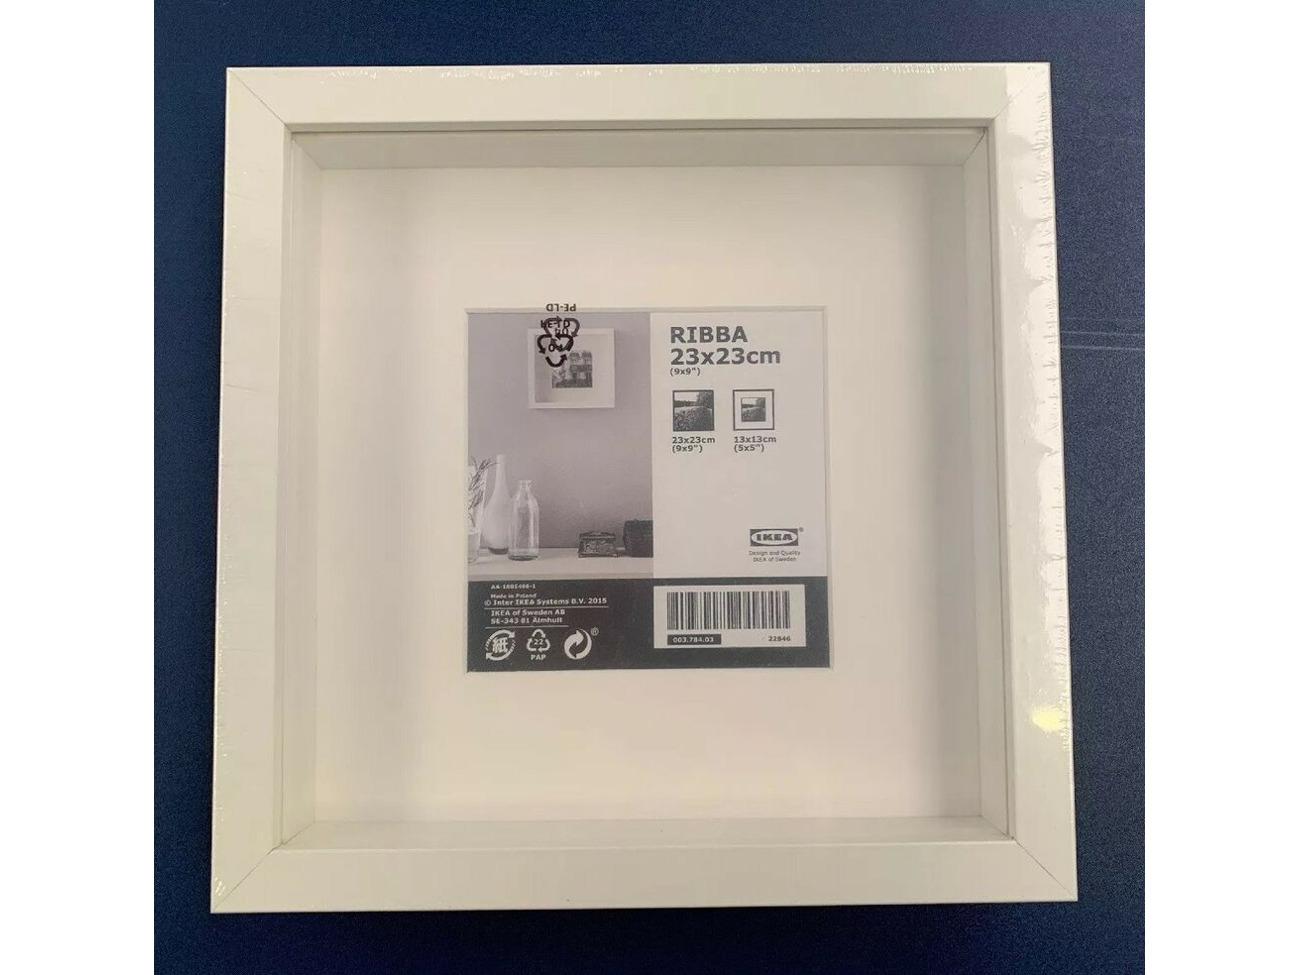 IKEA Ribba 9x9 White Picture Frame